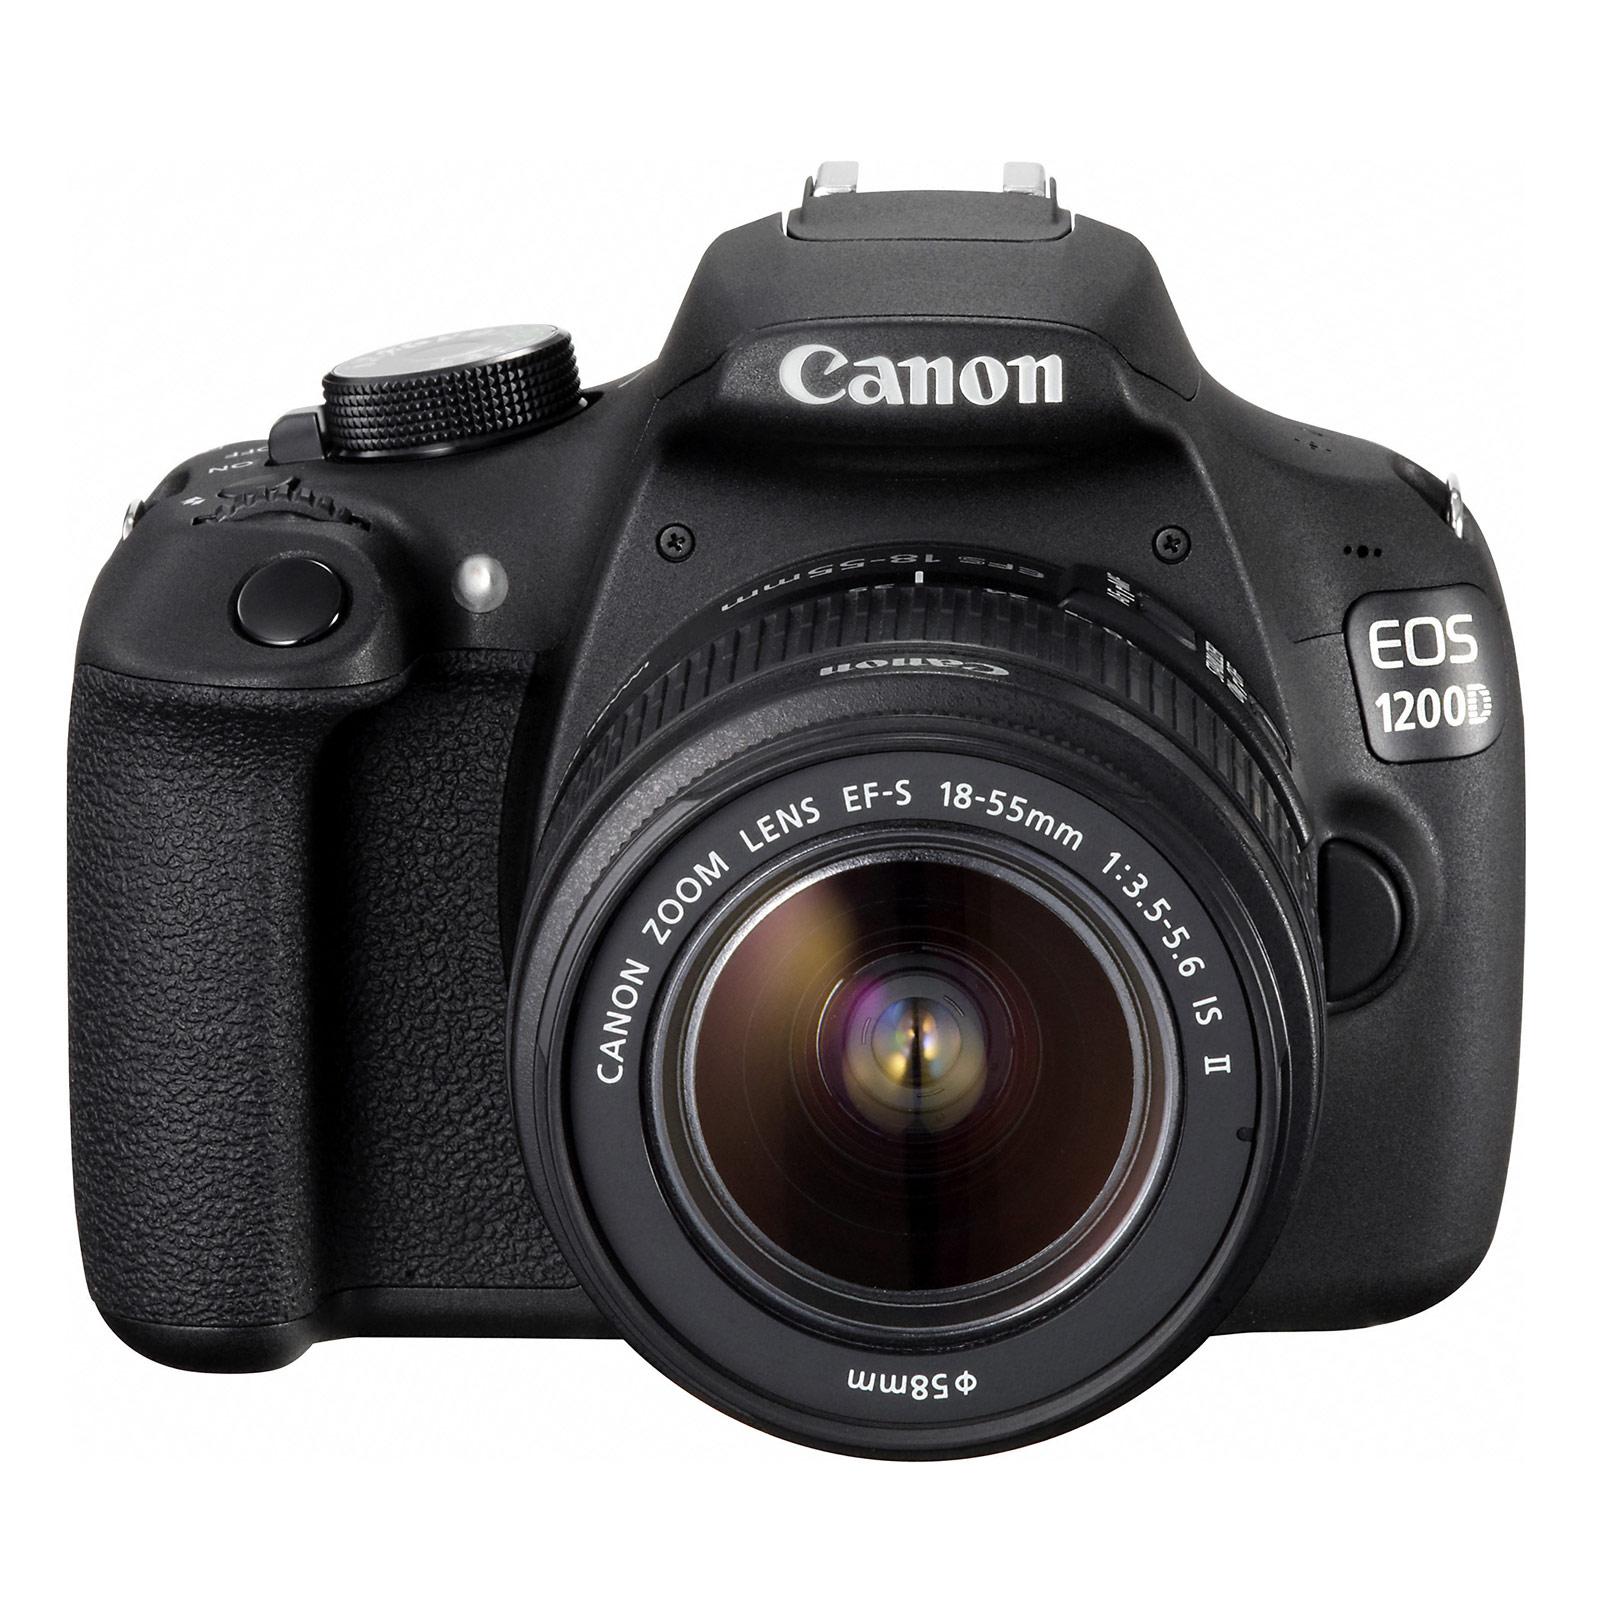 55f3b8f76b47e6 Appareil photo Reflex Canon EOS 1200D + Objectif EF-S 18-55mm IS II